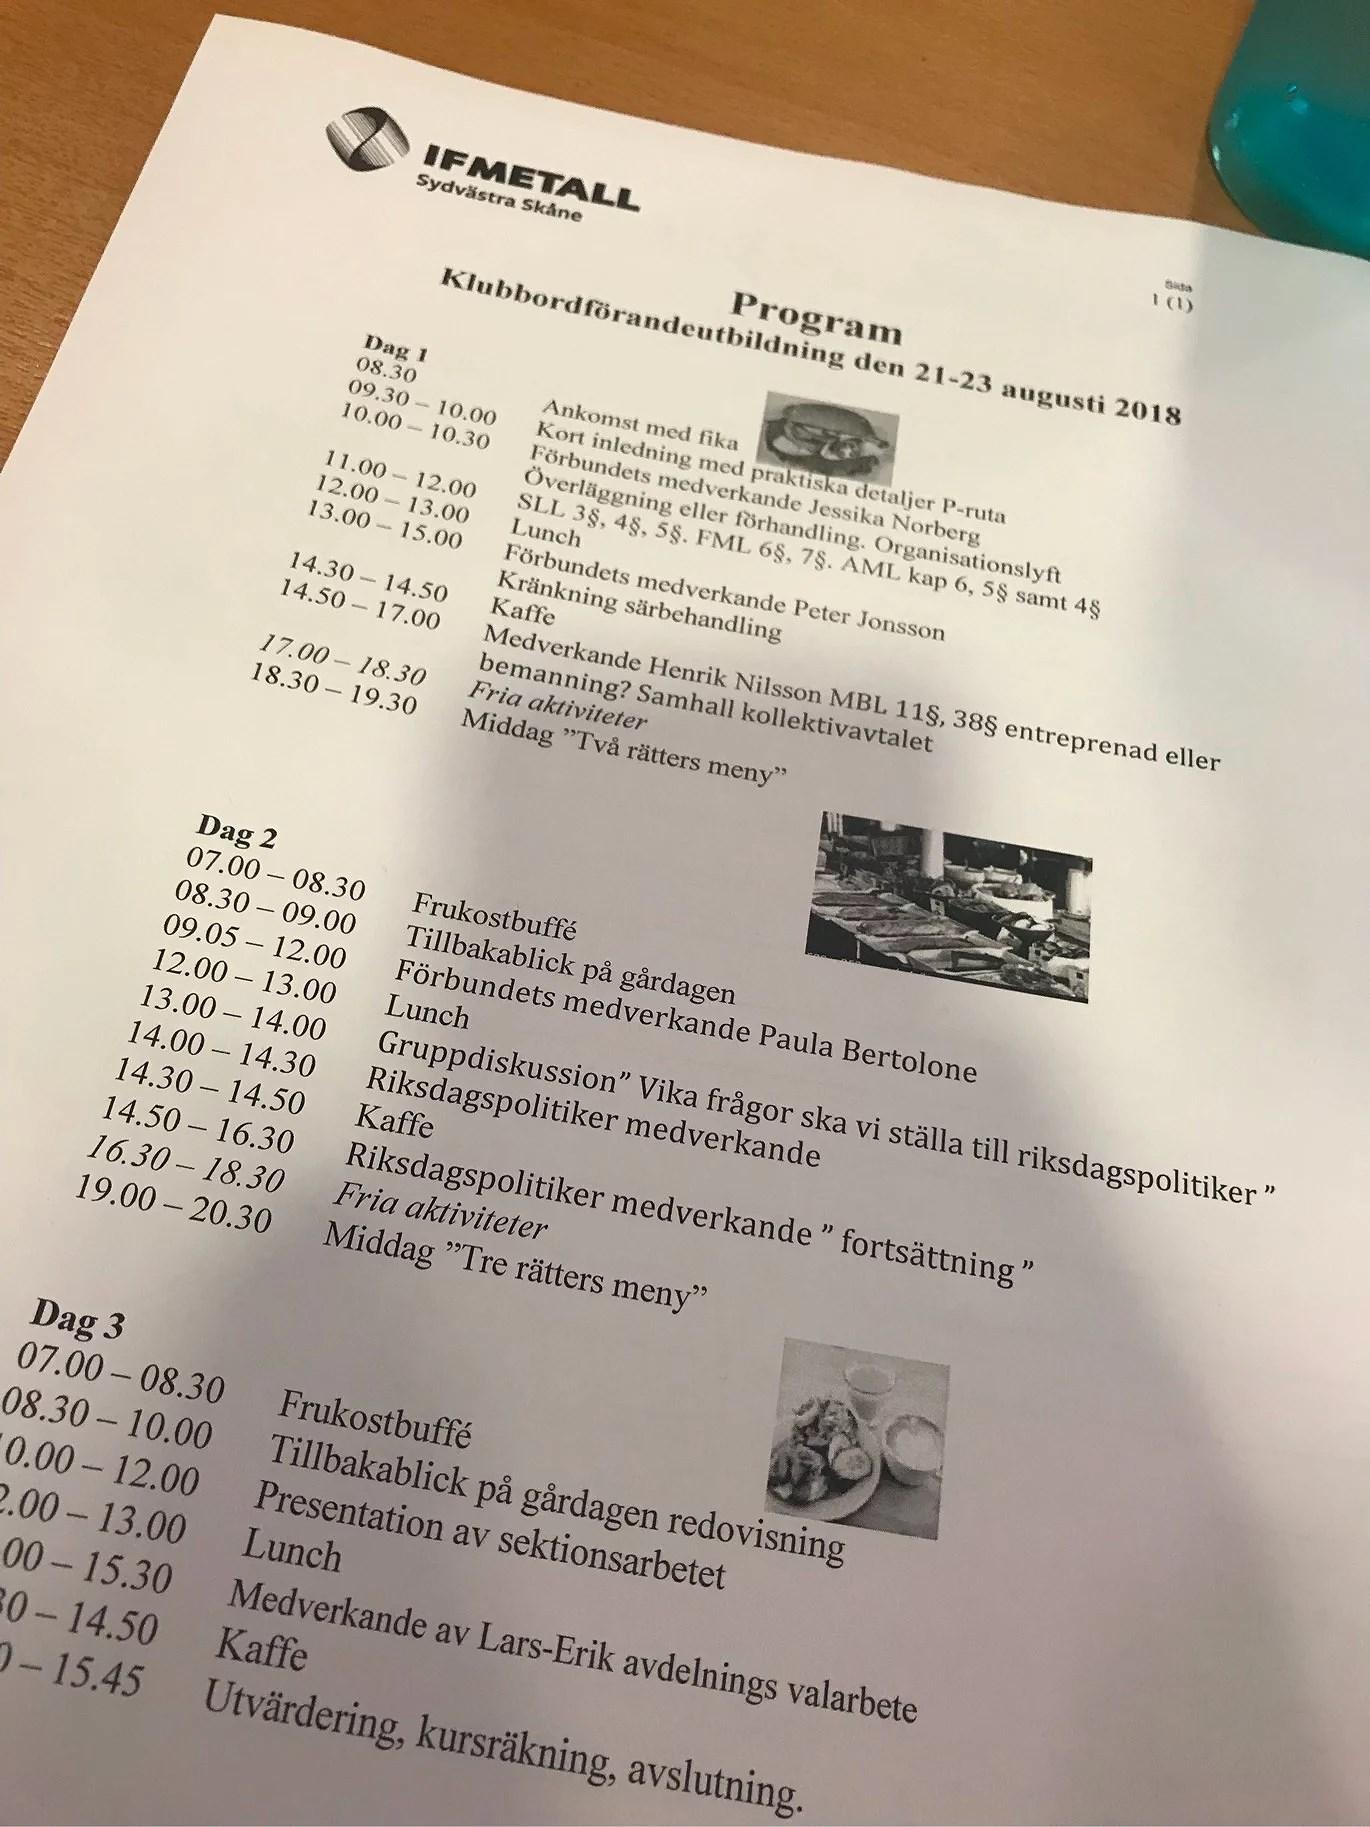 Klubbordförandekonferens